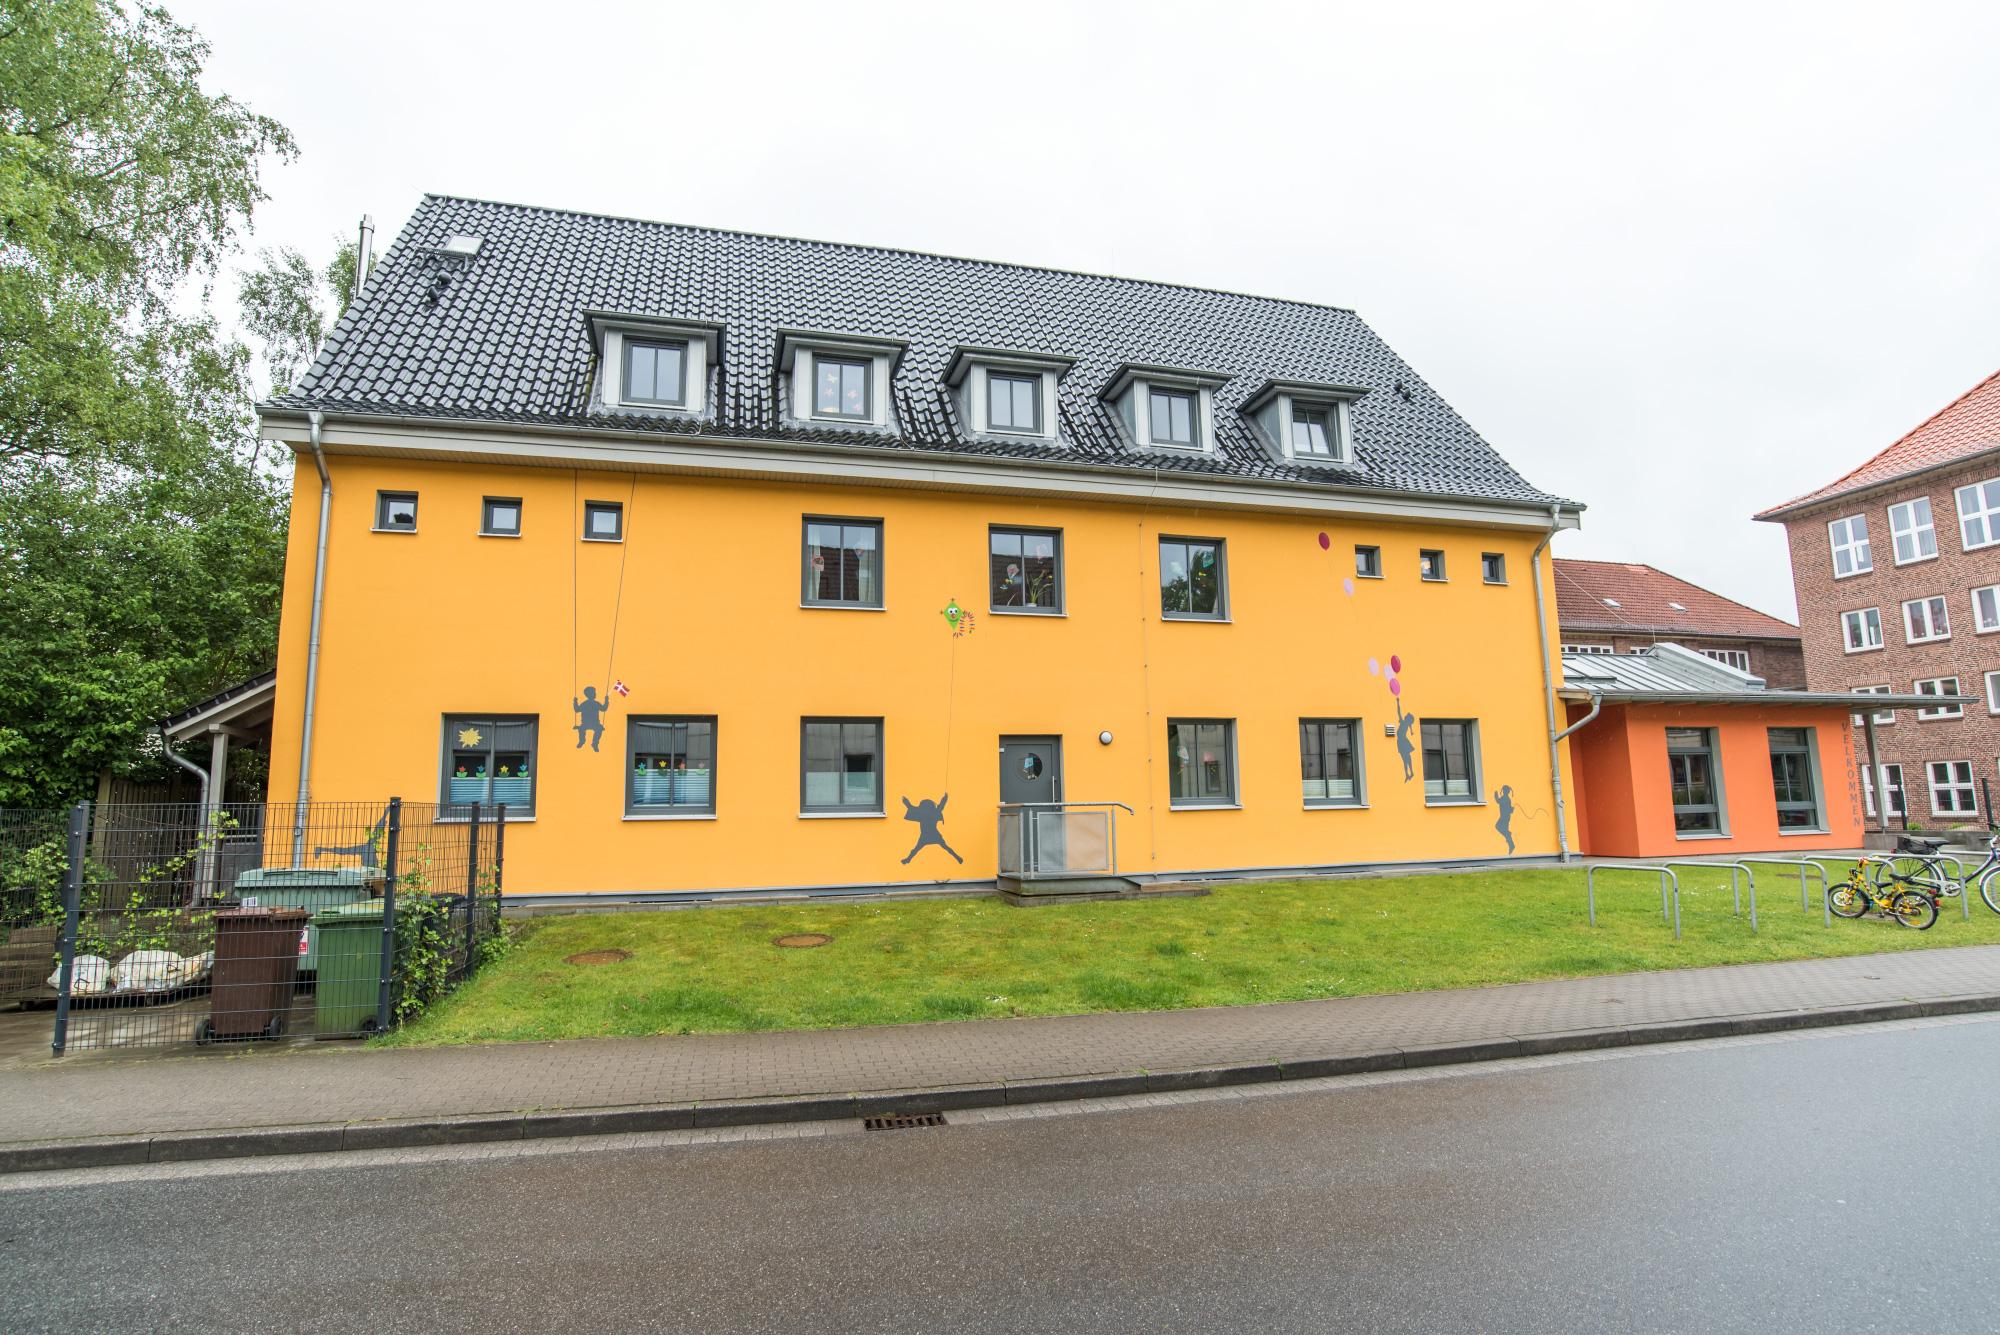 Kunst am Bau - Graffiti Künstler Schleswig